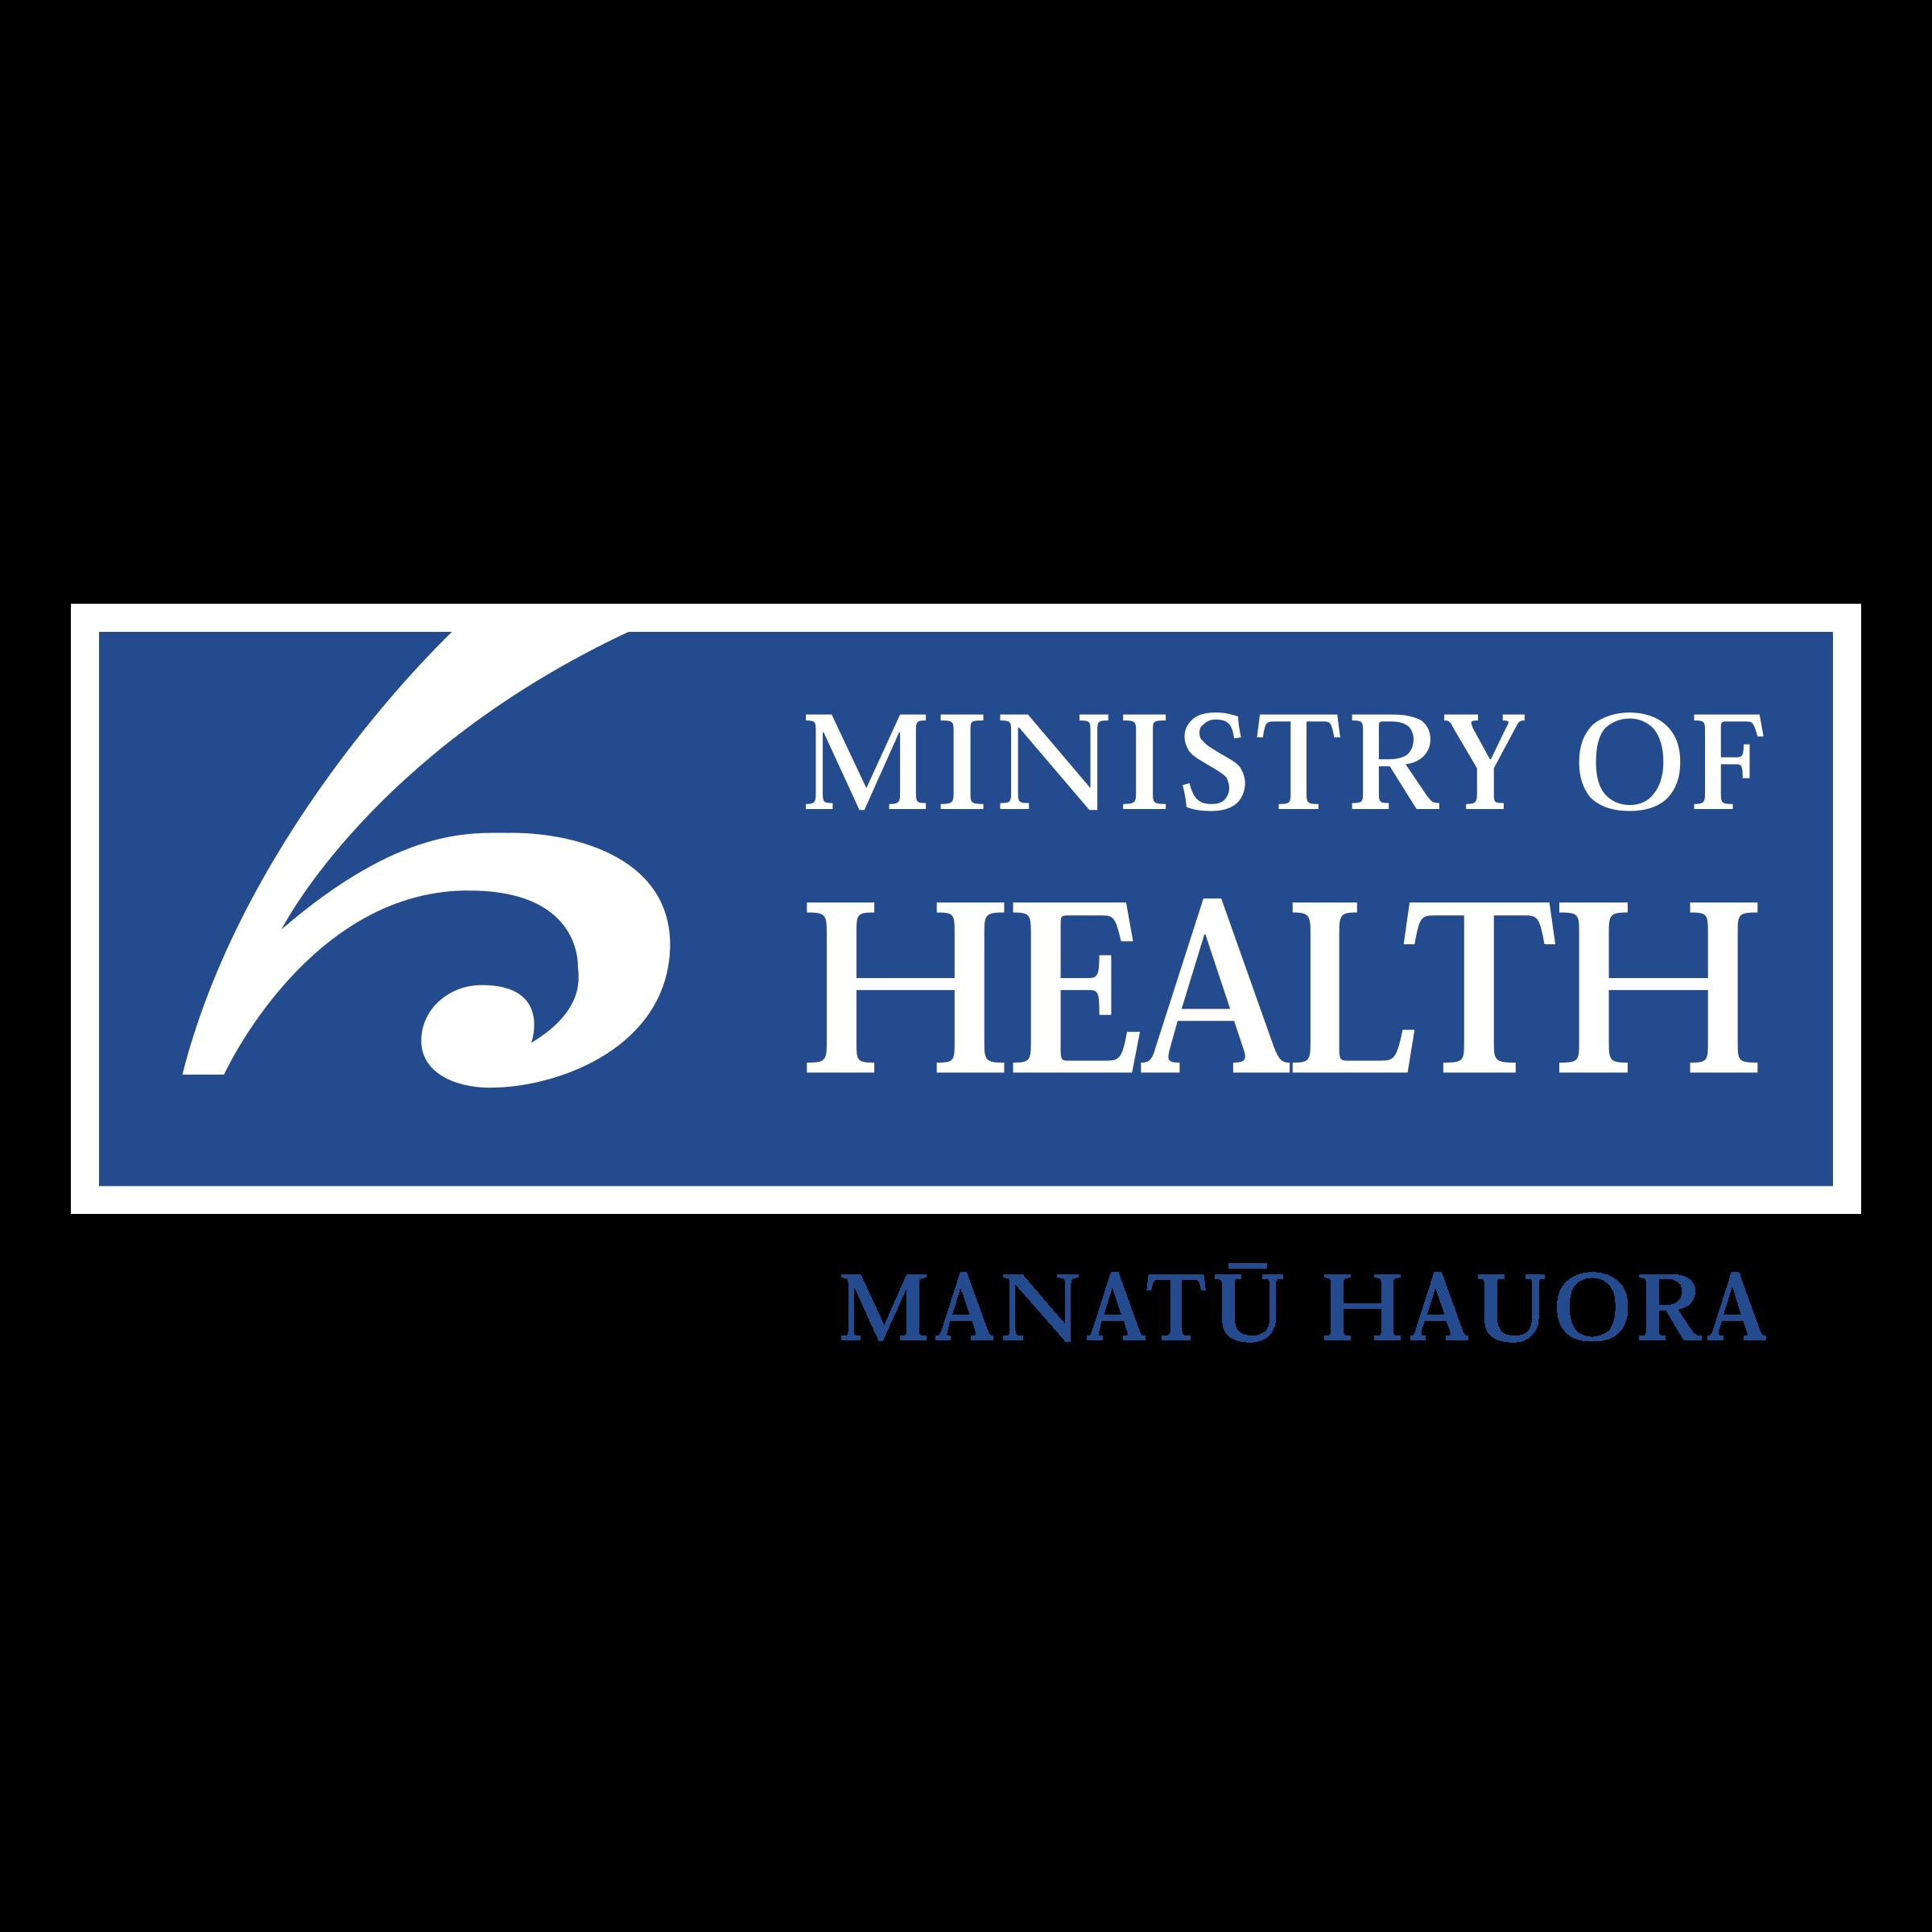 Ministry of Health Manatu Hauora Logo PNG Transparent ...